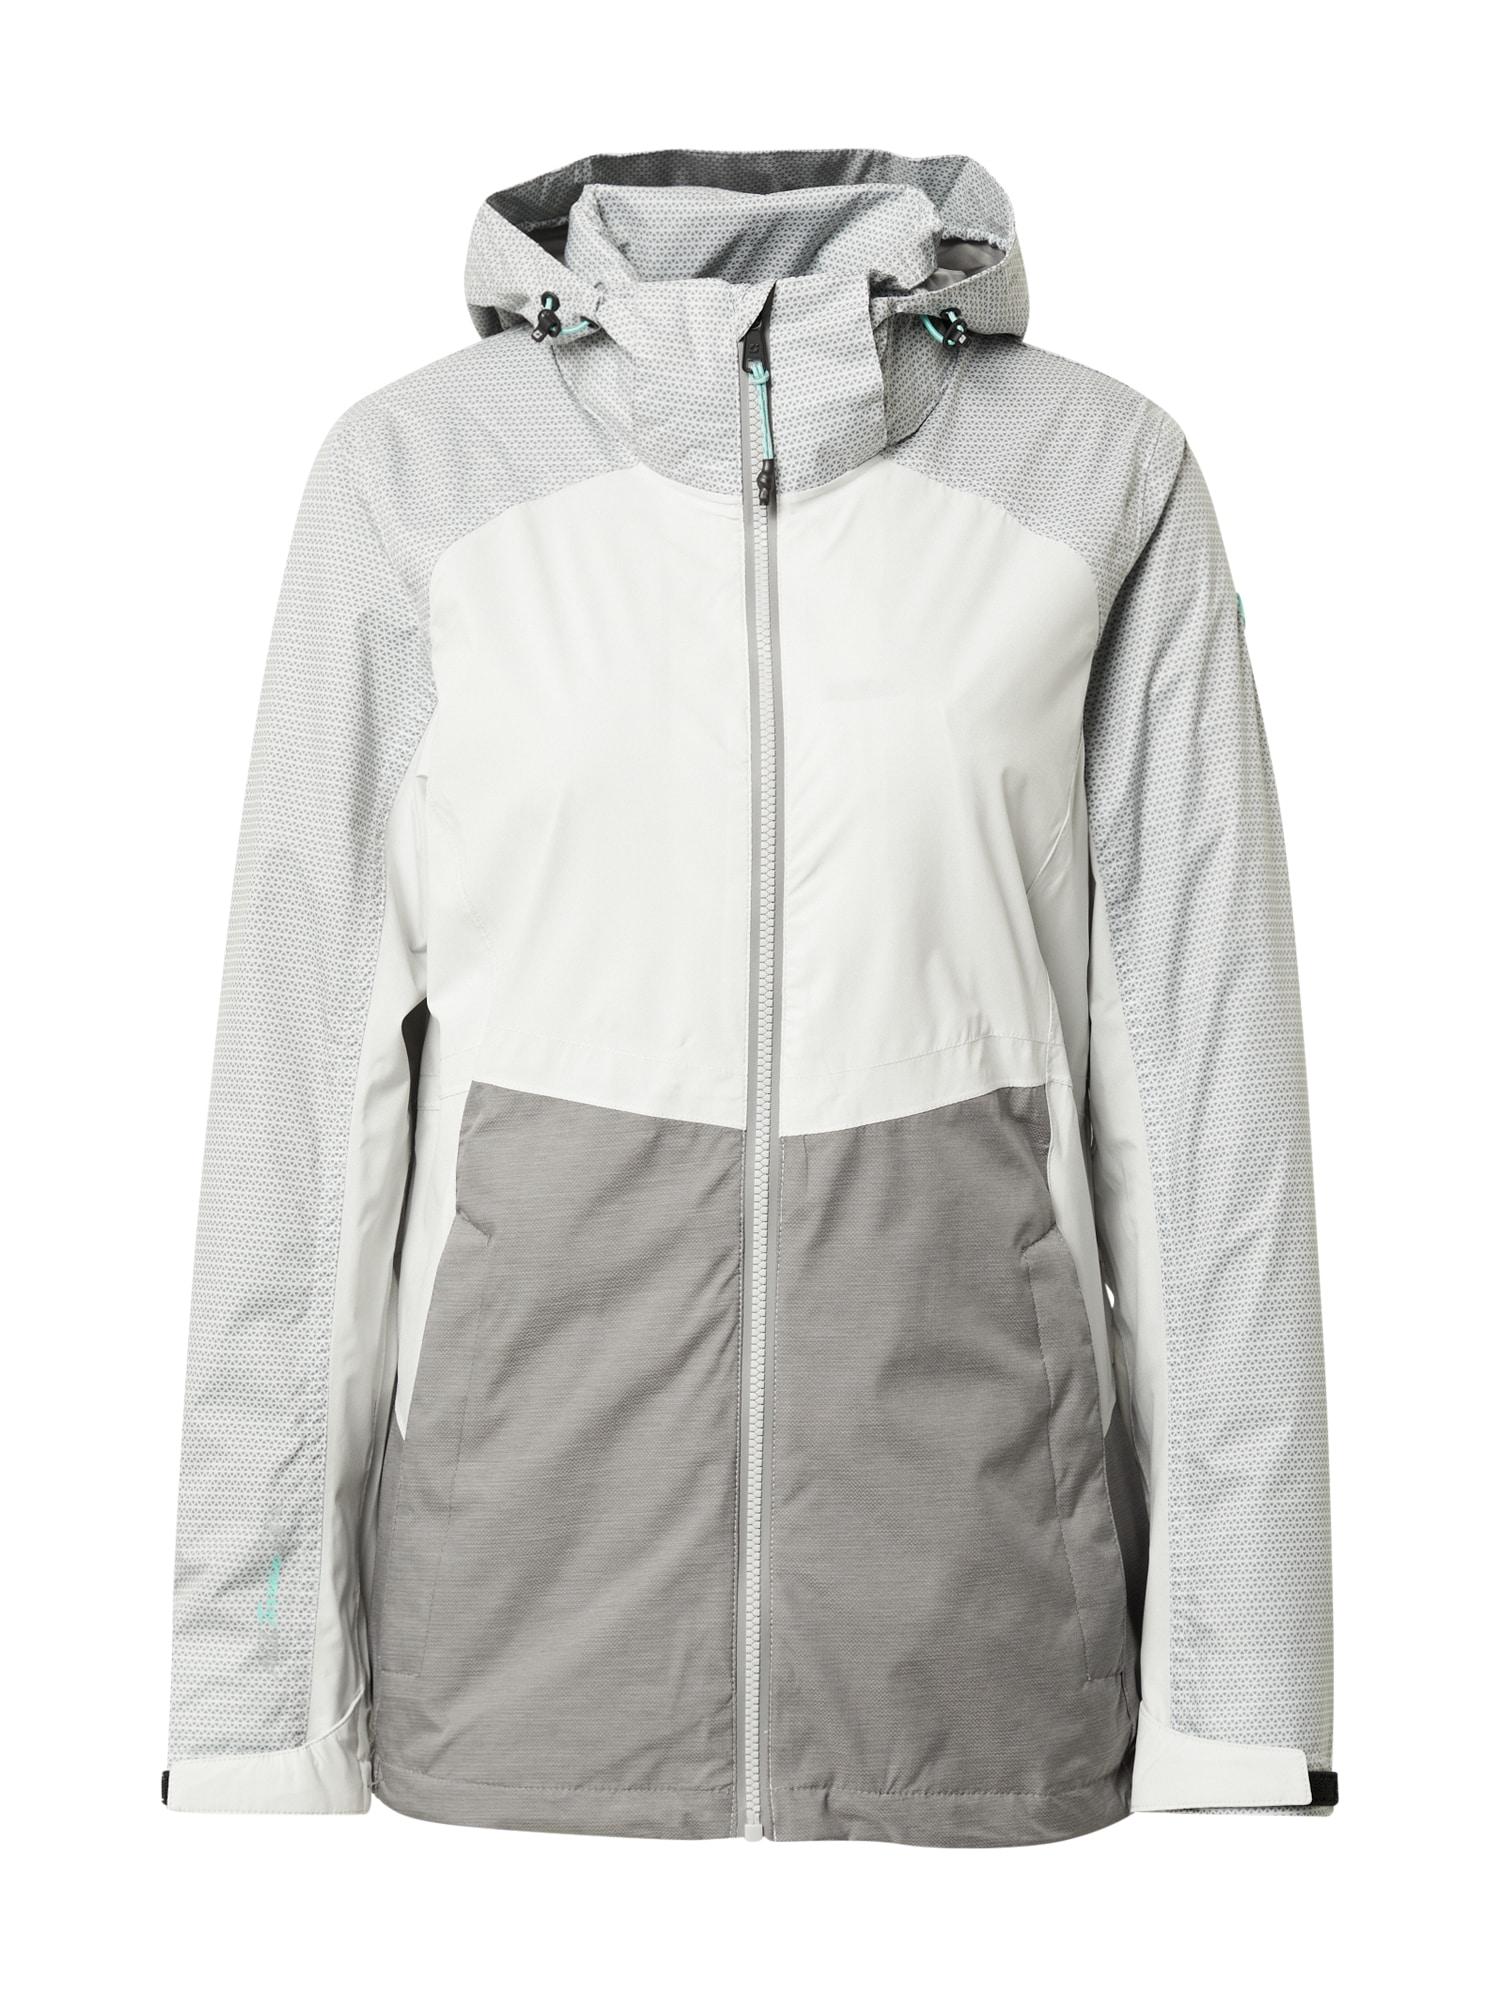 KILLTEC Sportovní bunda 'Sveti'  šedá / bílá / světle šedá